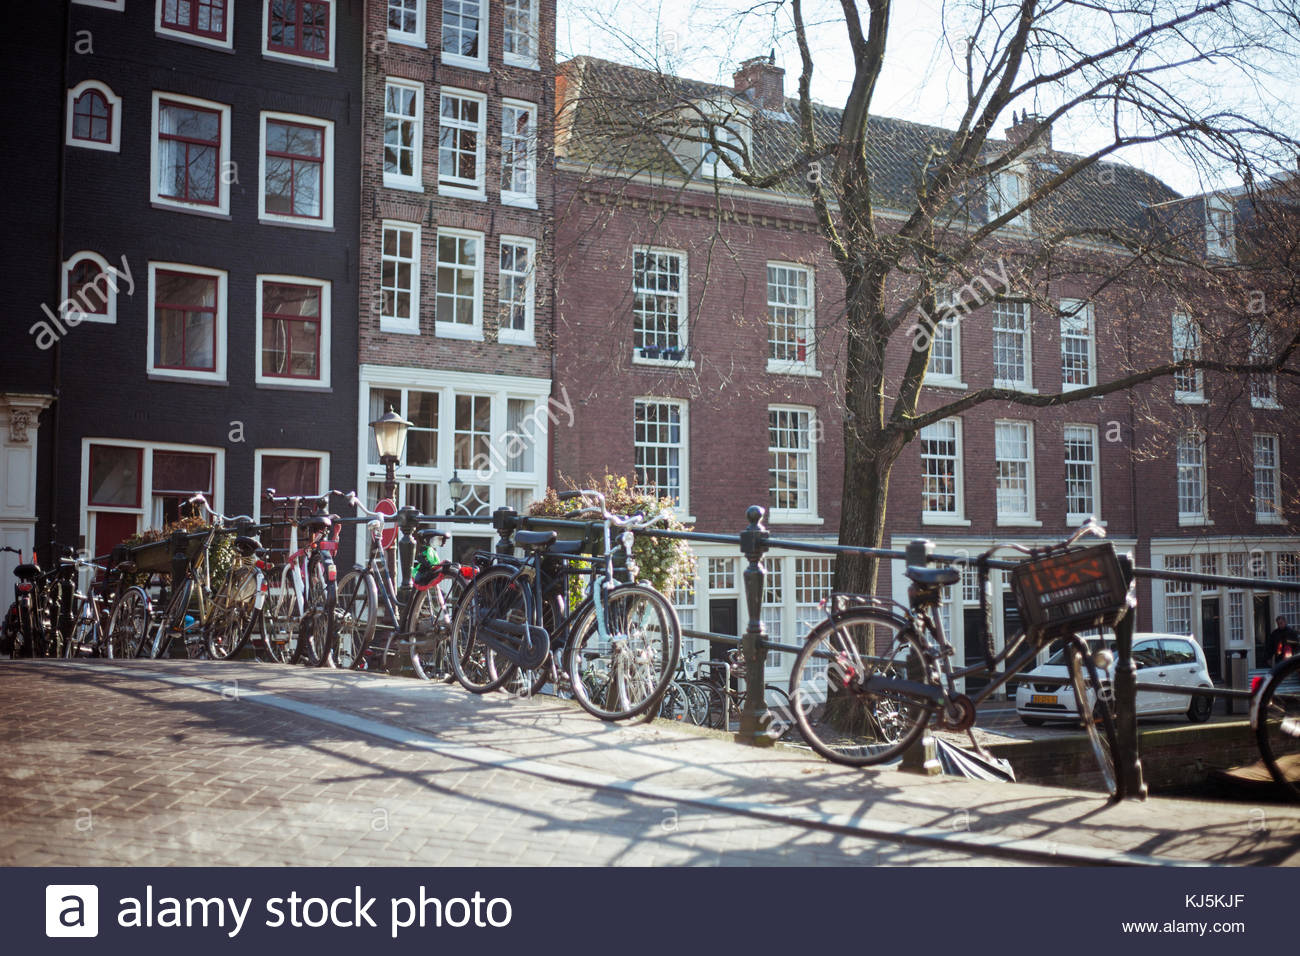 amsterdam bicycles - Stock Image